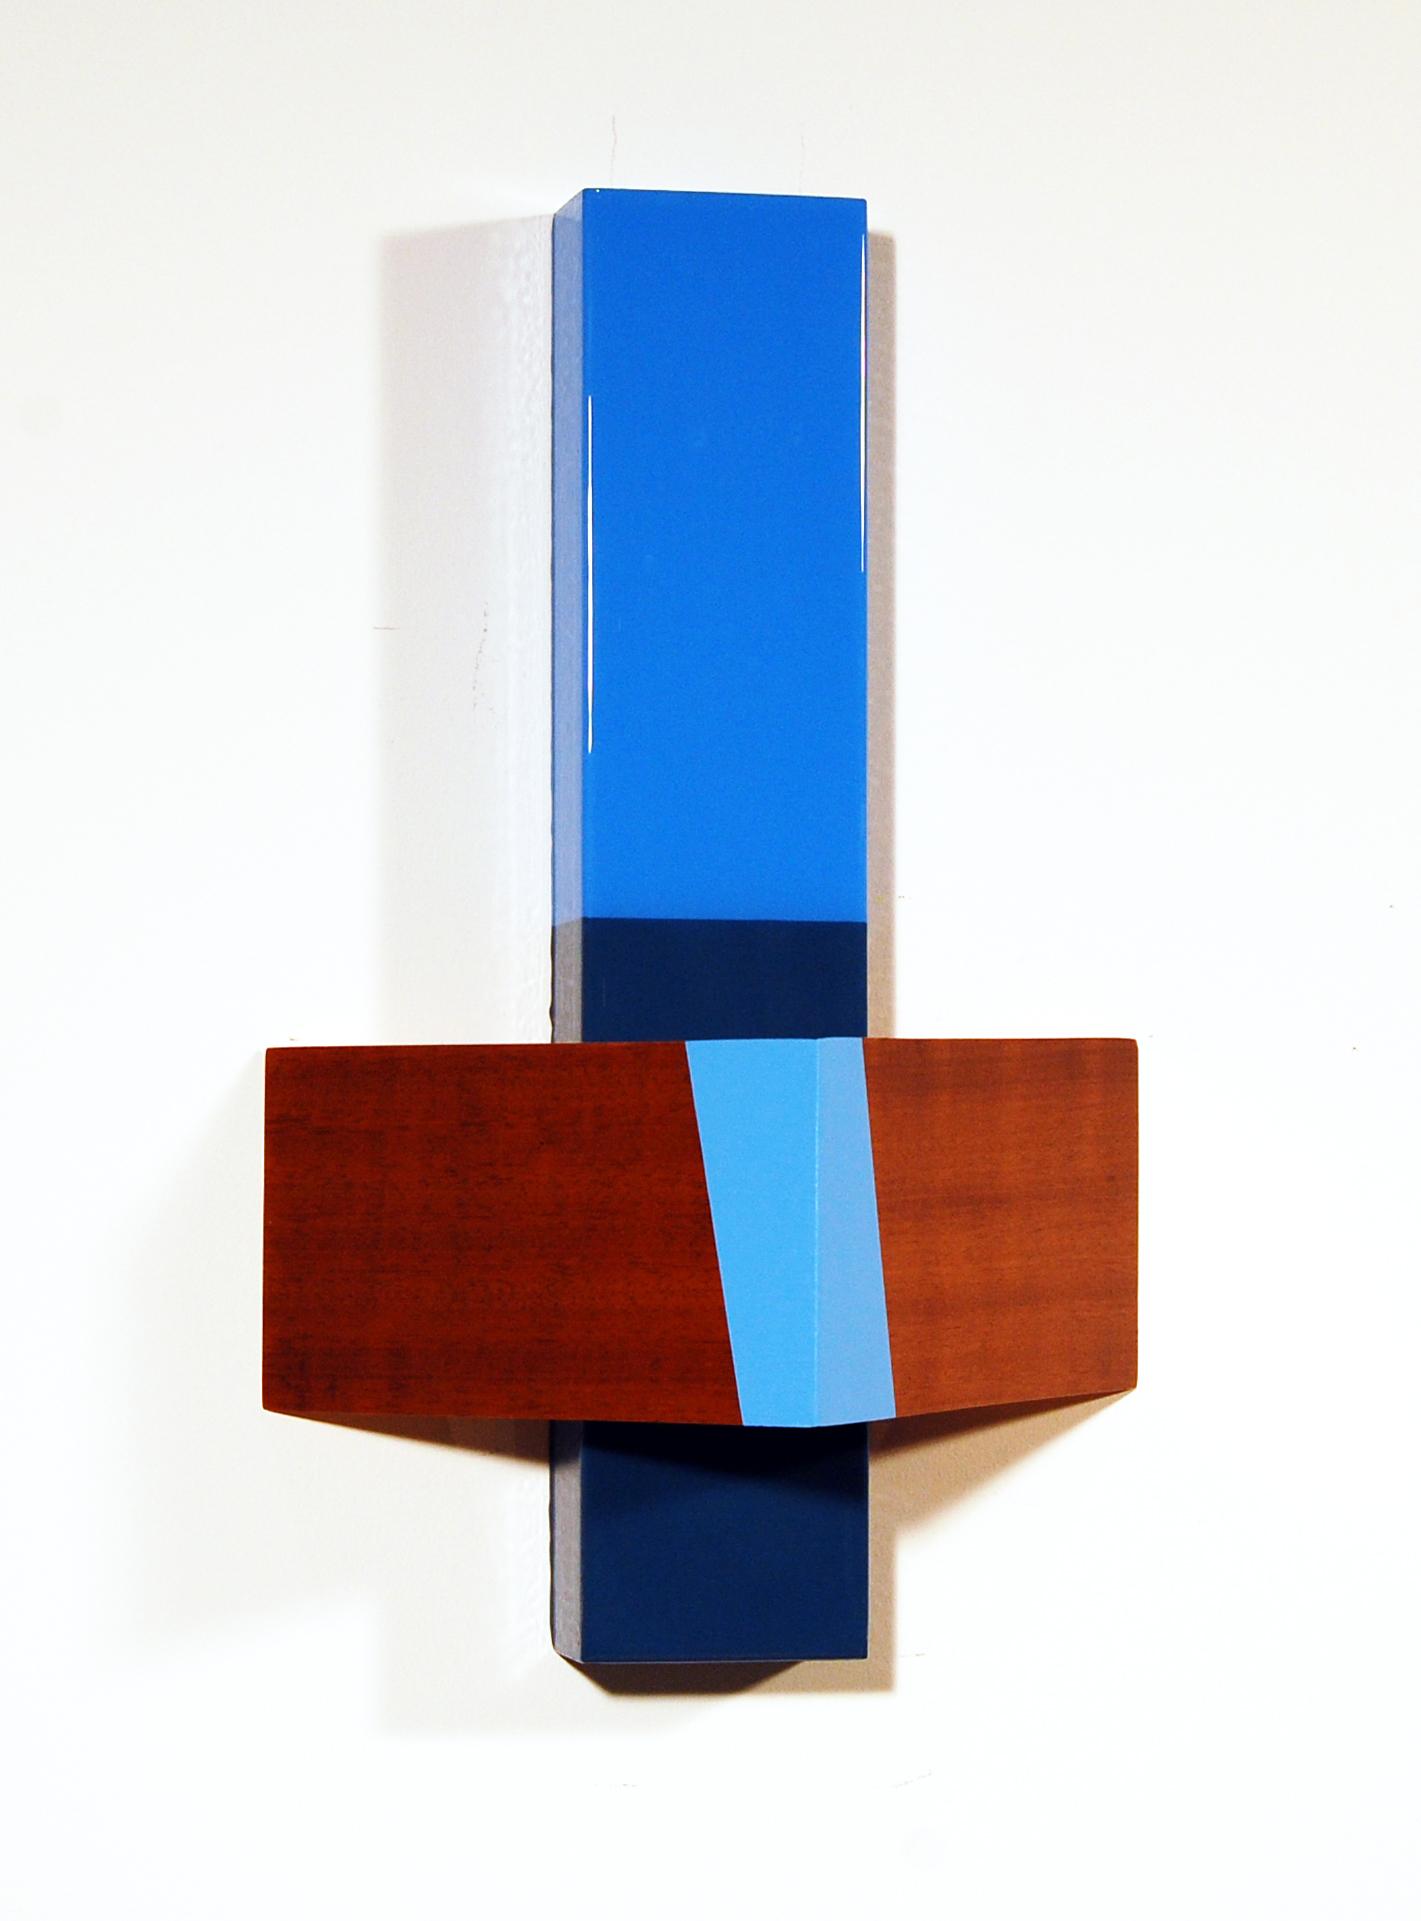 "Puzzle #89  Acrylic, MDF, Brazilian cherry – Unique - 2014 16"" x 20"" x 6"" / 41 x 51 x 15 cm"